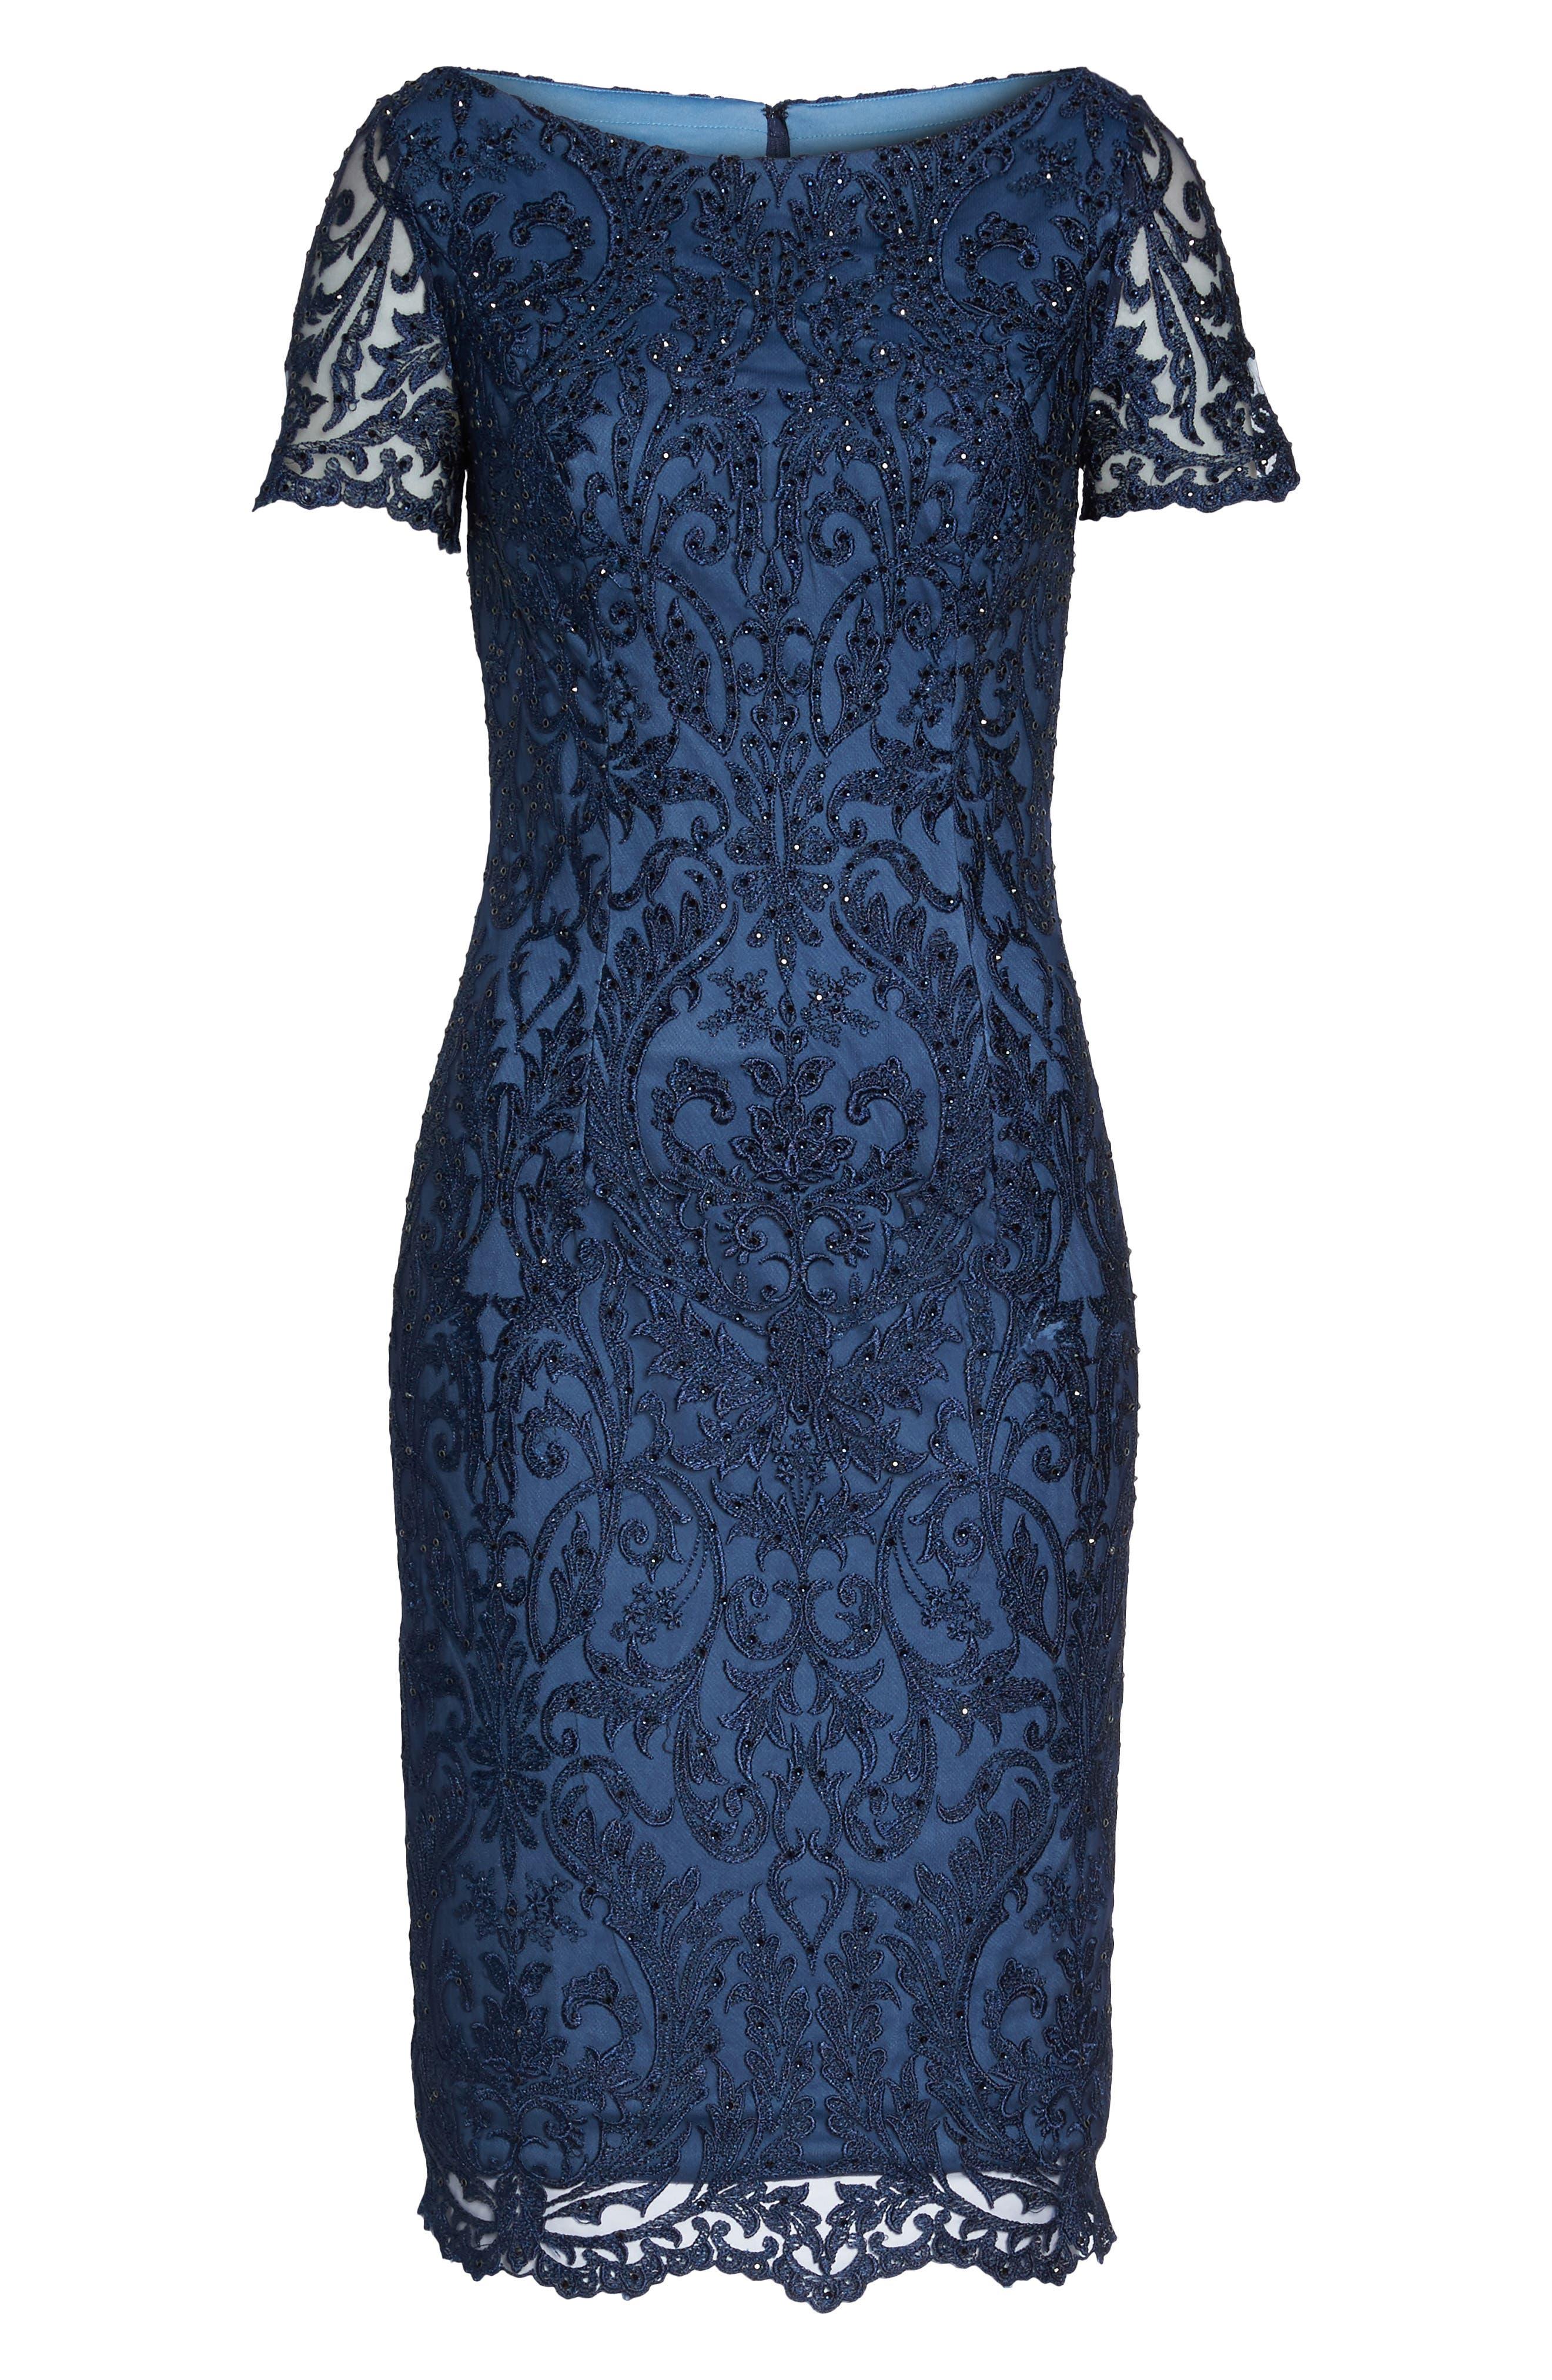 LA FEMME, Beaded Lace Sheath Dress, Alternate thumbnail 6, color, SLATE BLUE